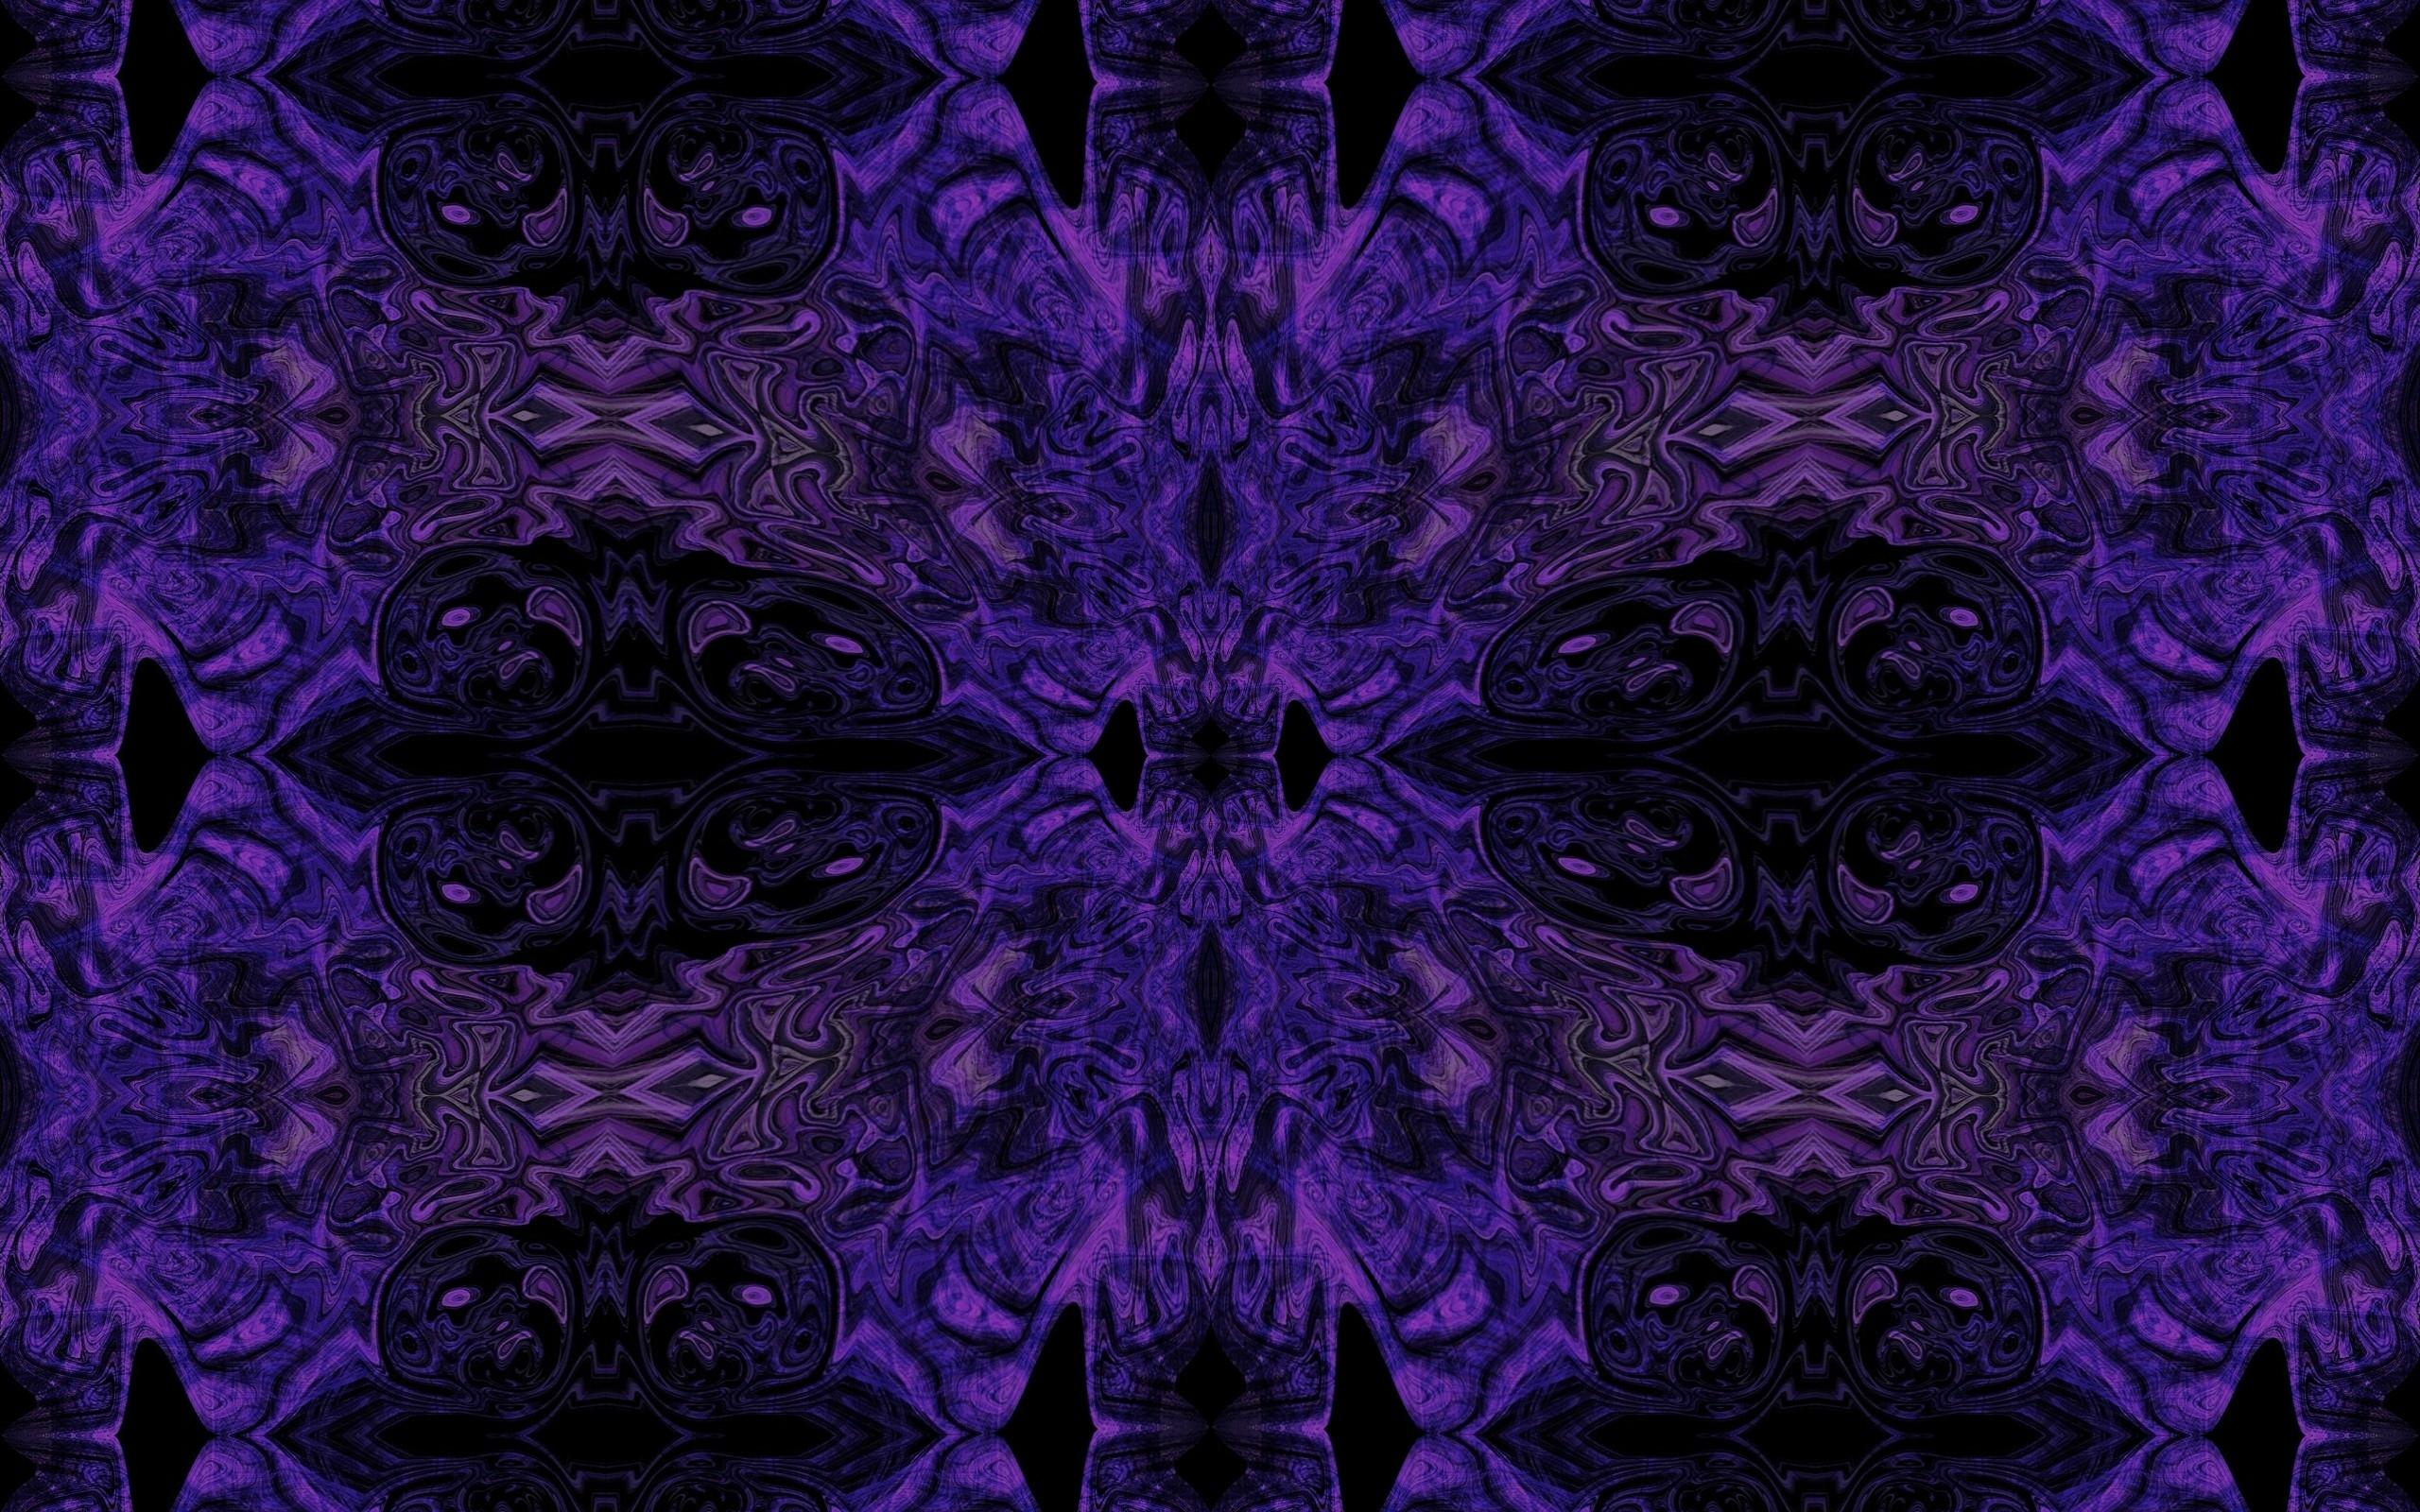 kaleidoscope hd widescreen wallpaper wallpapersafari